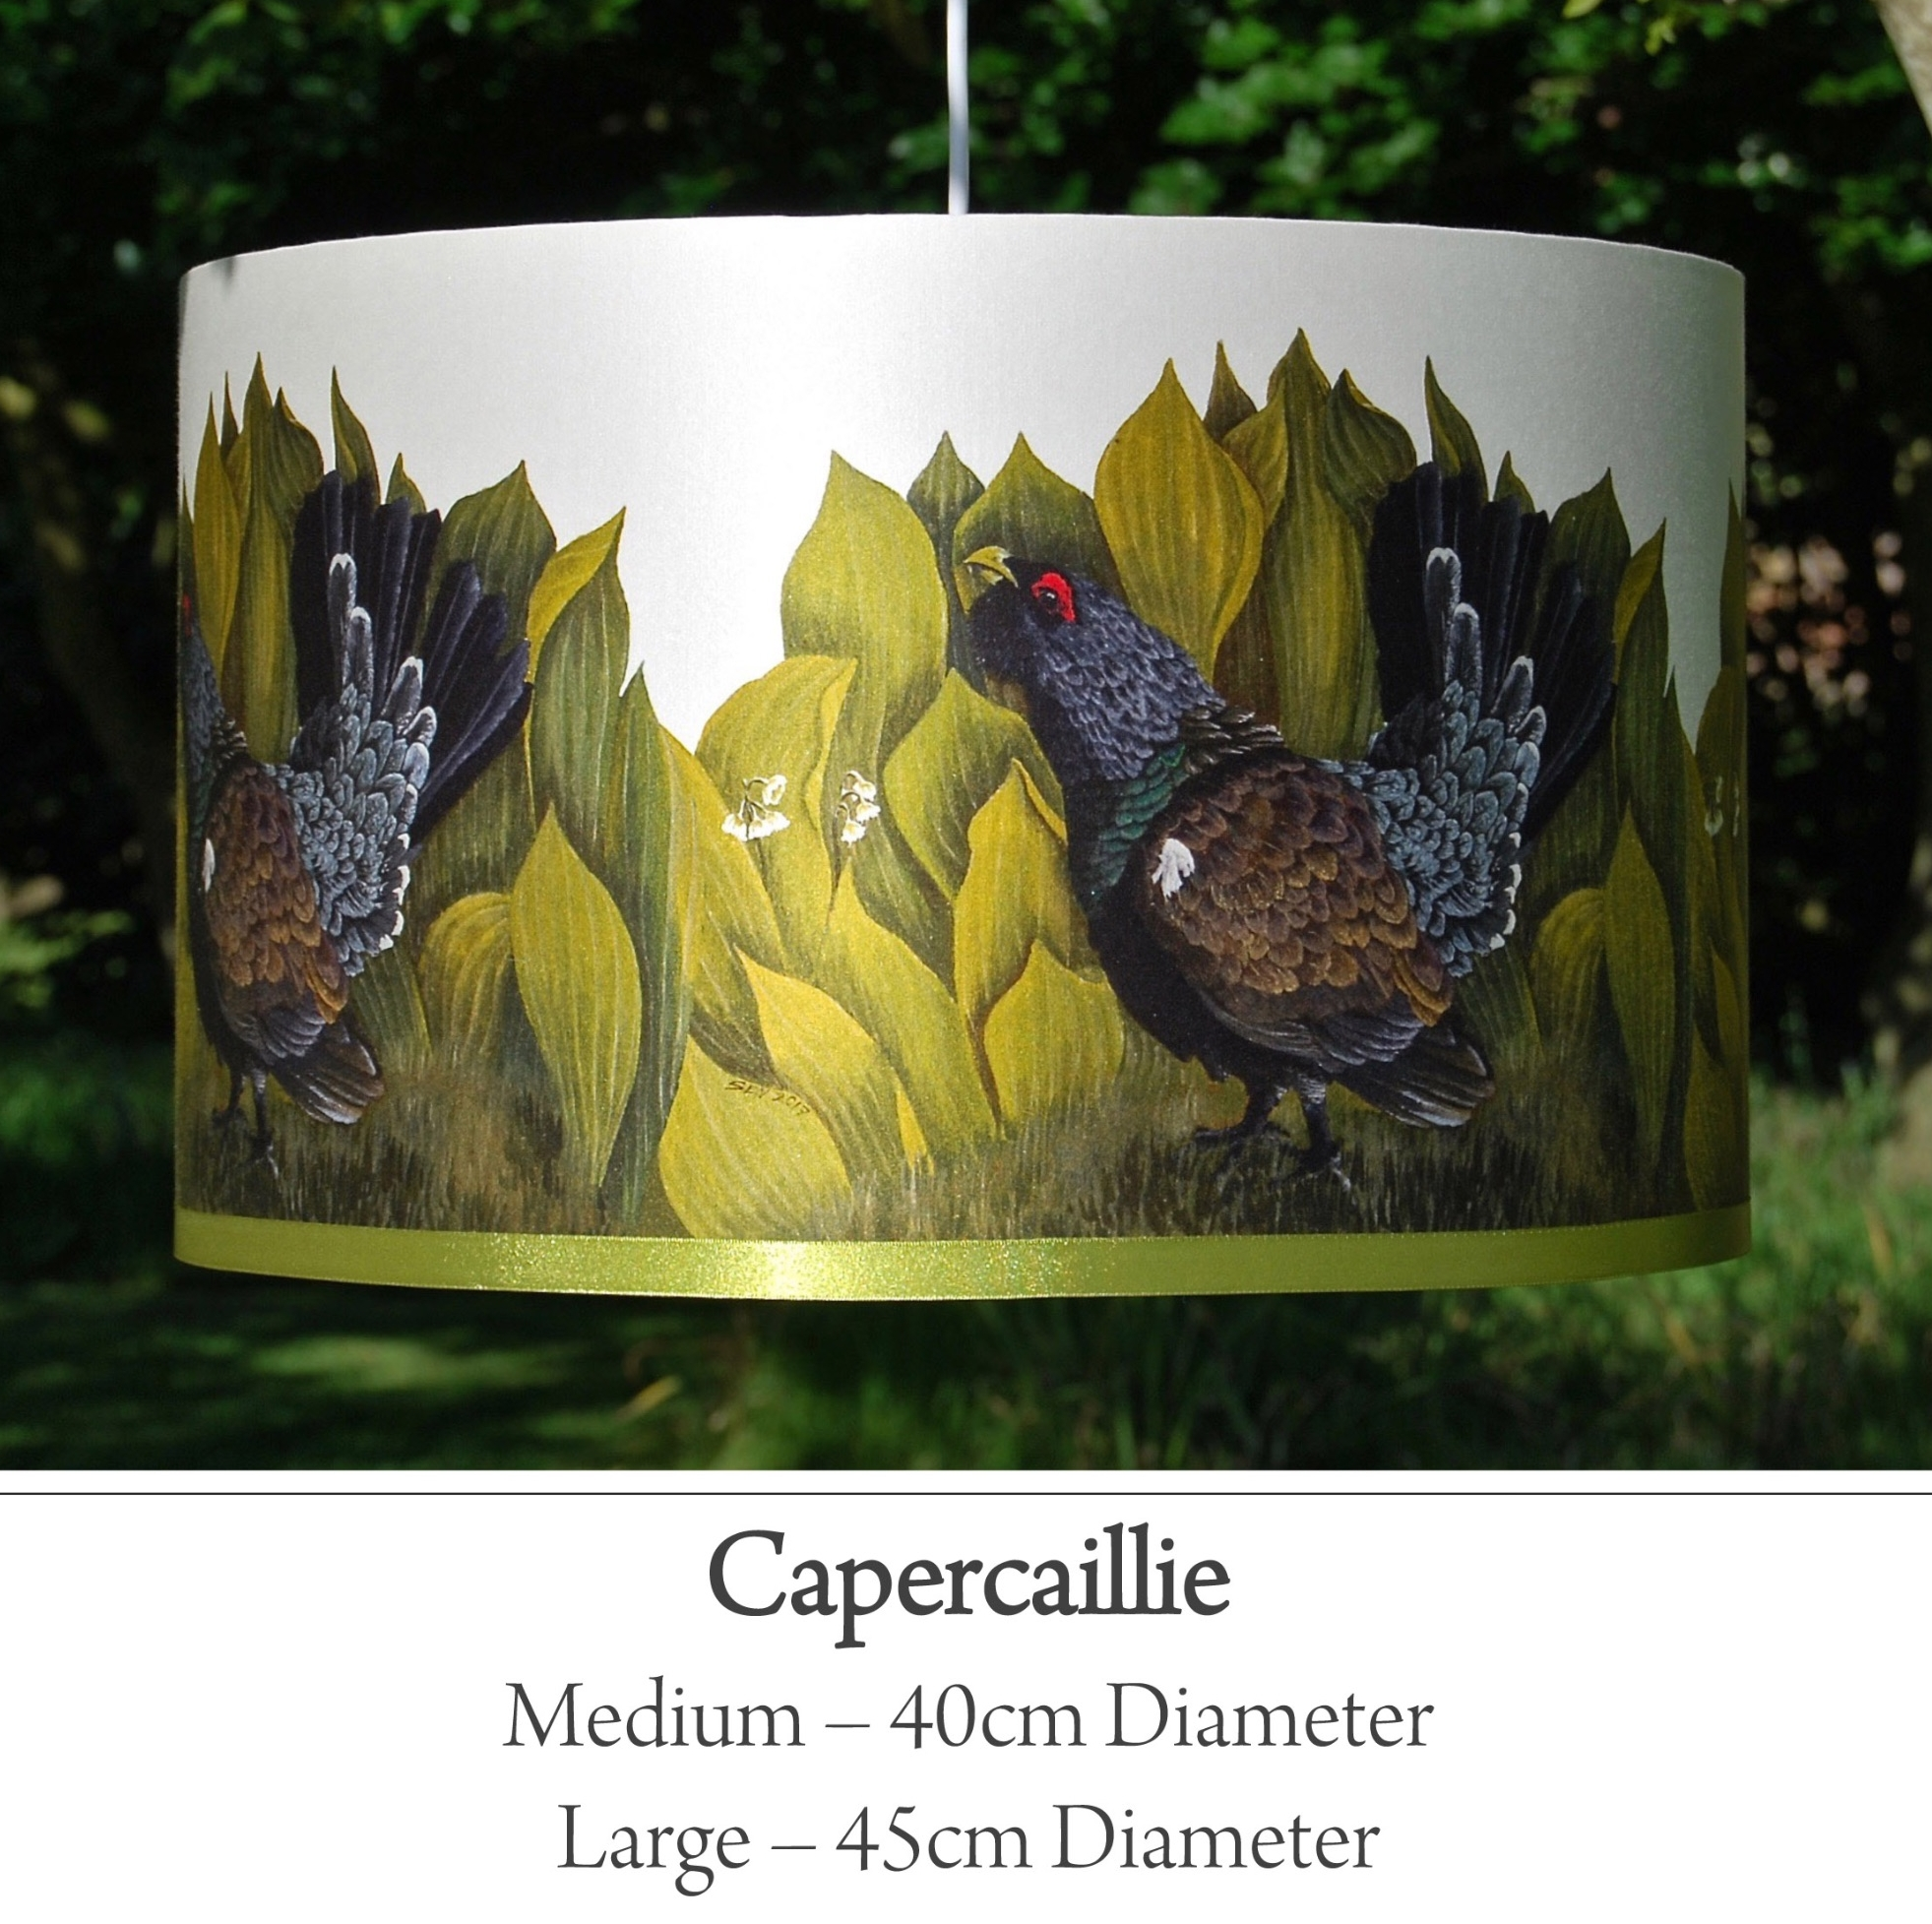 capercaillie bird